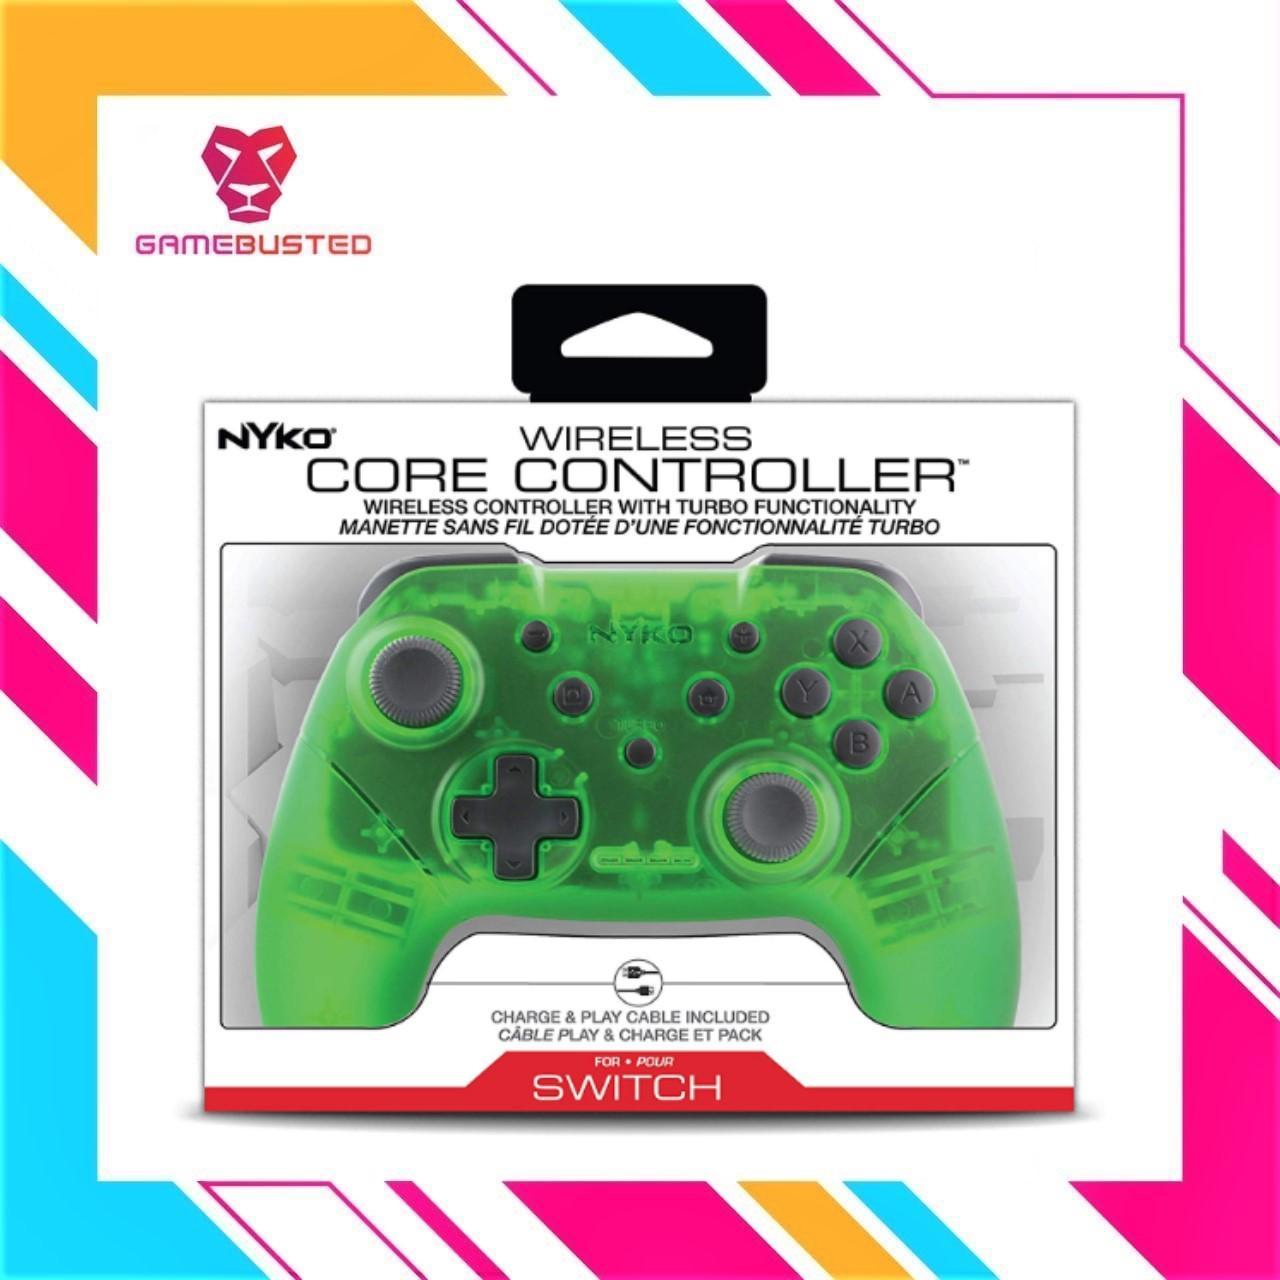 NYKO Nintendo Switch Wireless Core Controller Translucent Green (87264)